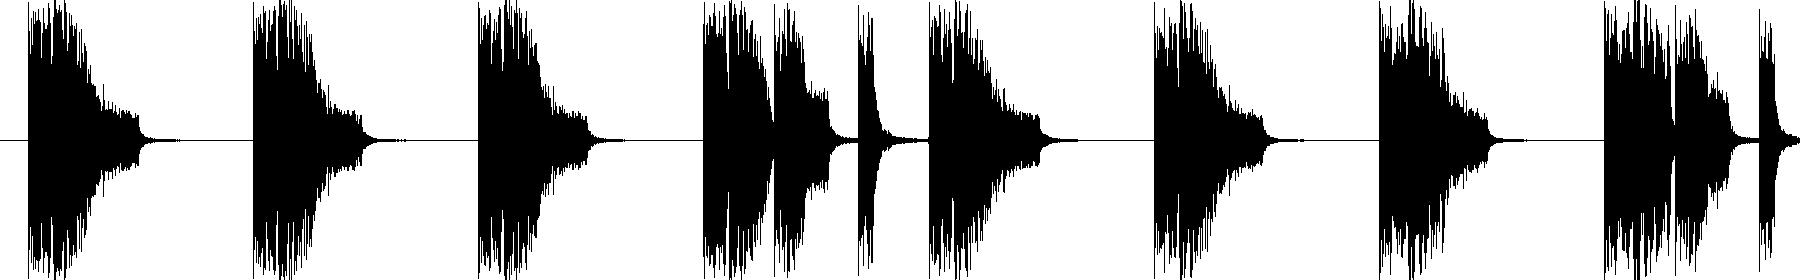 vedh melodyloop 108 fm9 em9 124bpm